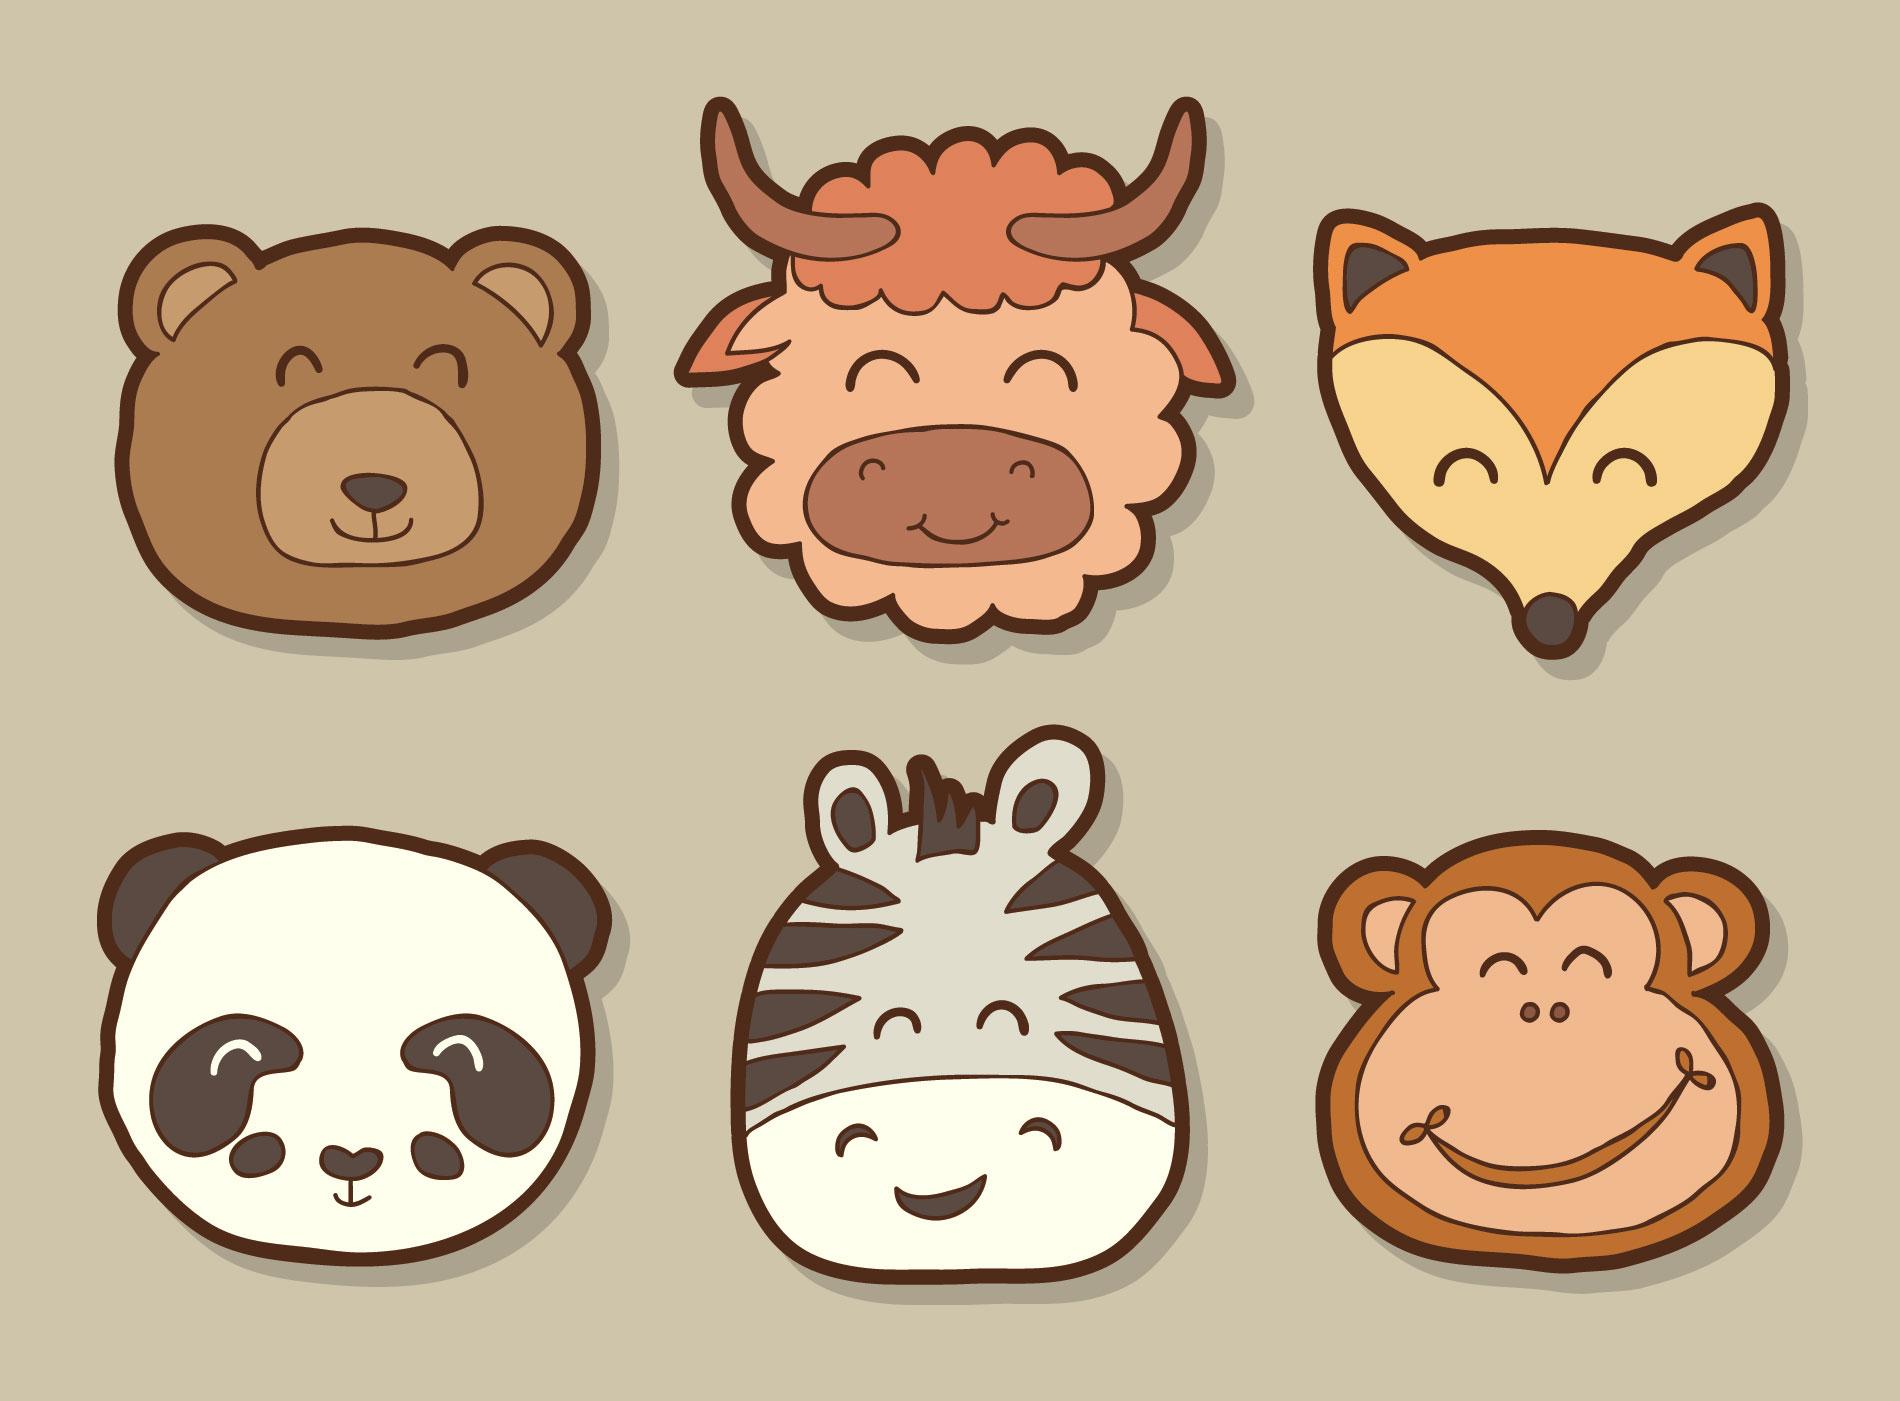 Hand Drawn Wild Animal Face Vector - Download Free Vectors ...